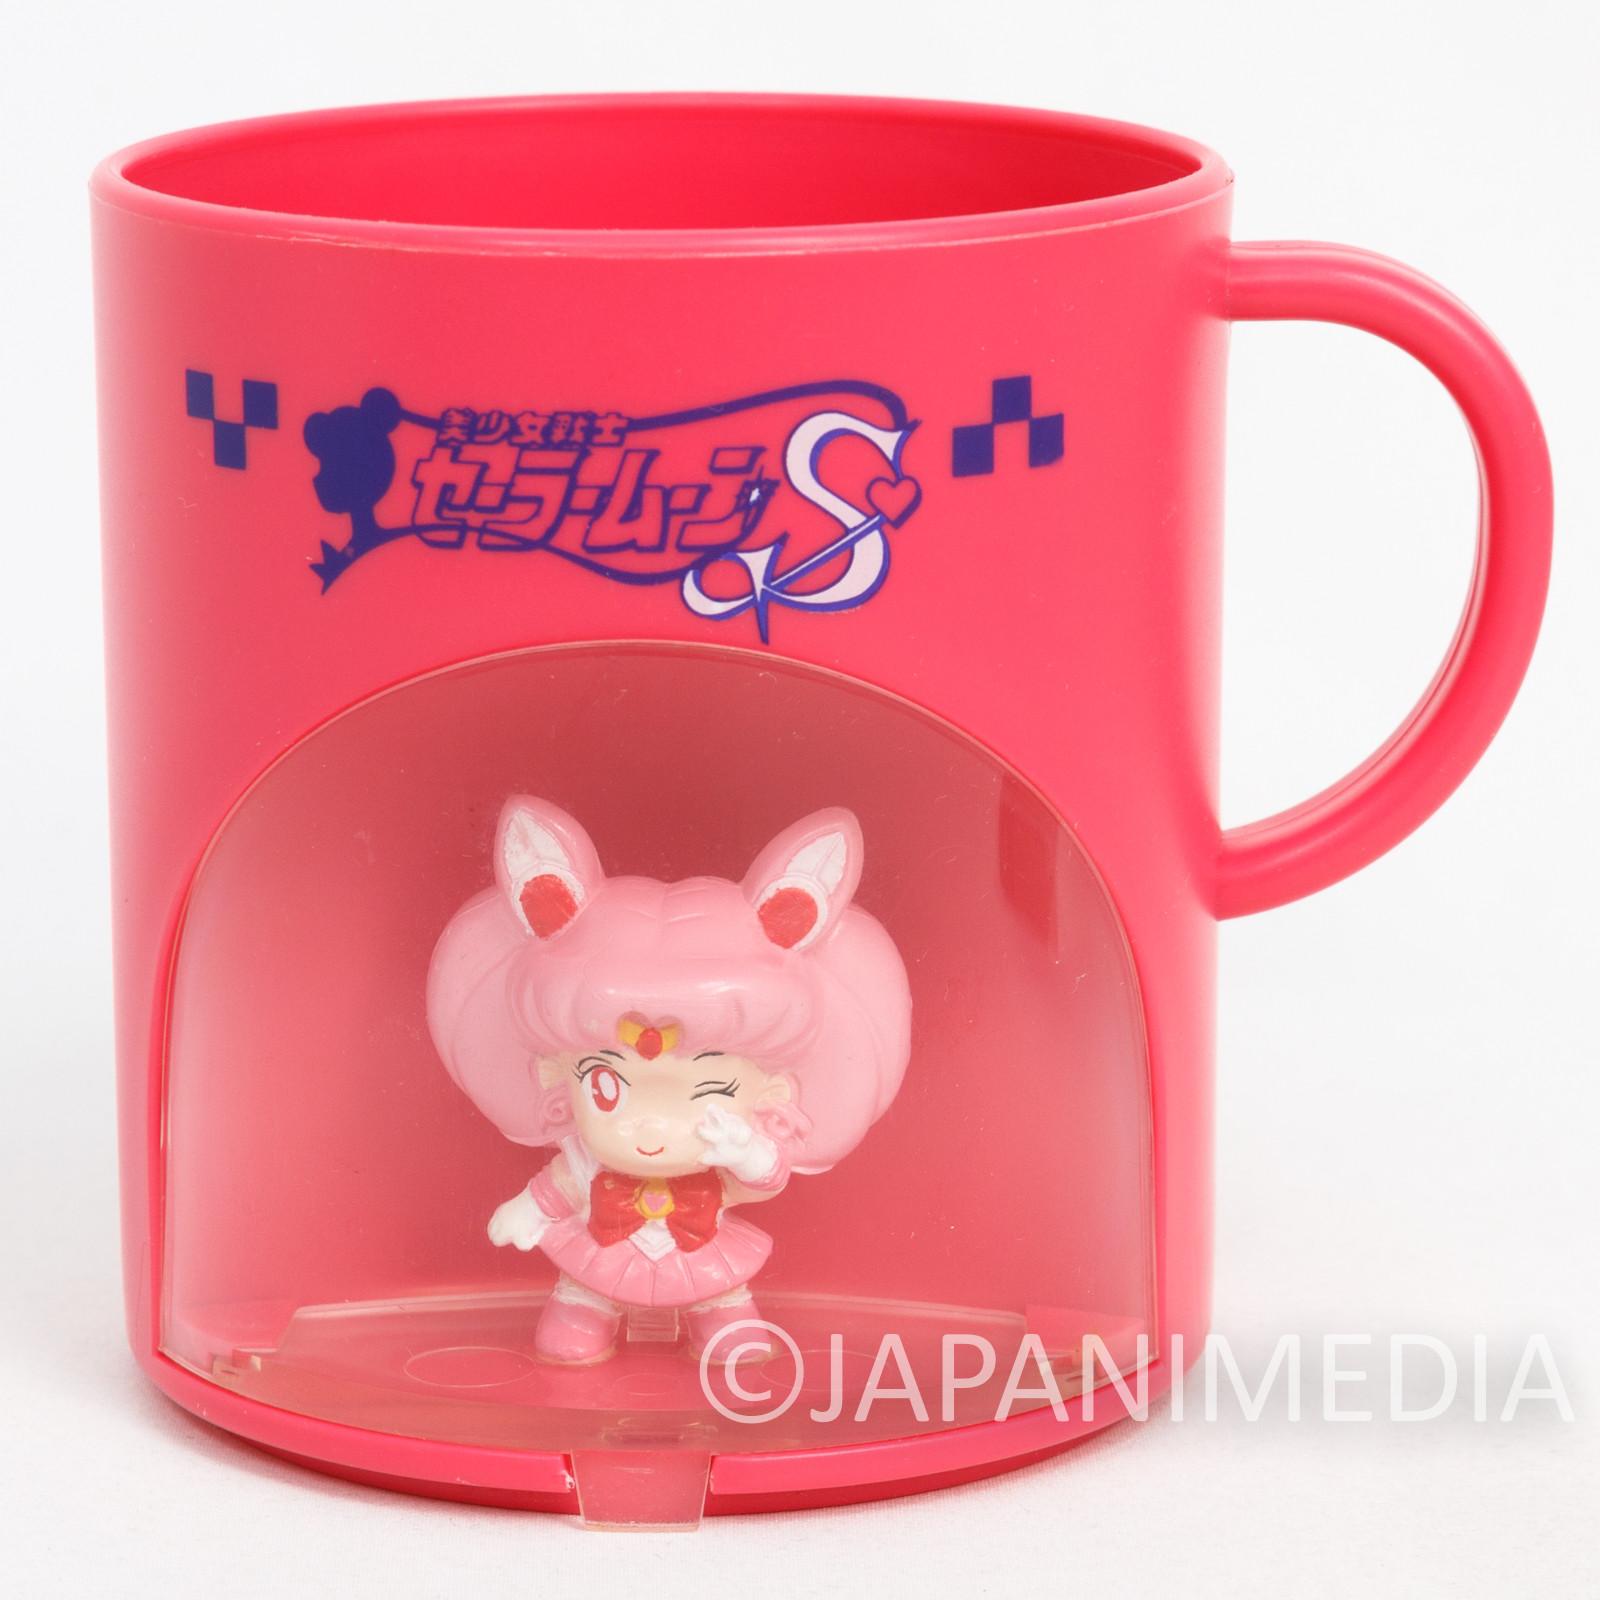 Sailor Moon S Chibi Moon (Chibiusa) Figure in Plastic Mug Banpresto 1994 JAPAN ANIME MANGA